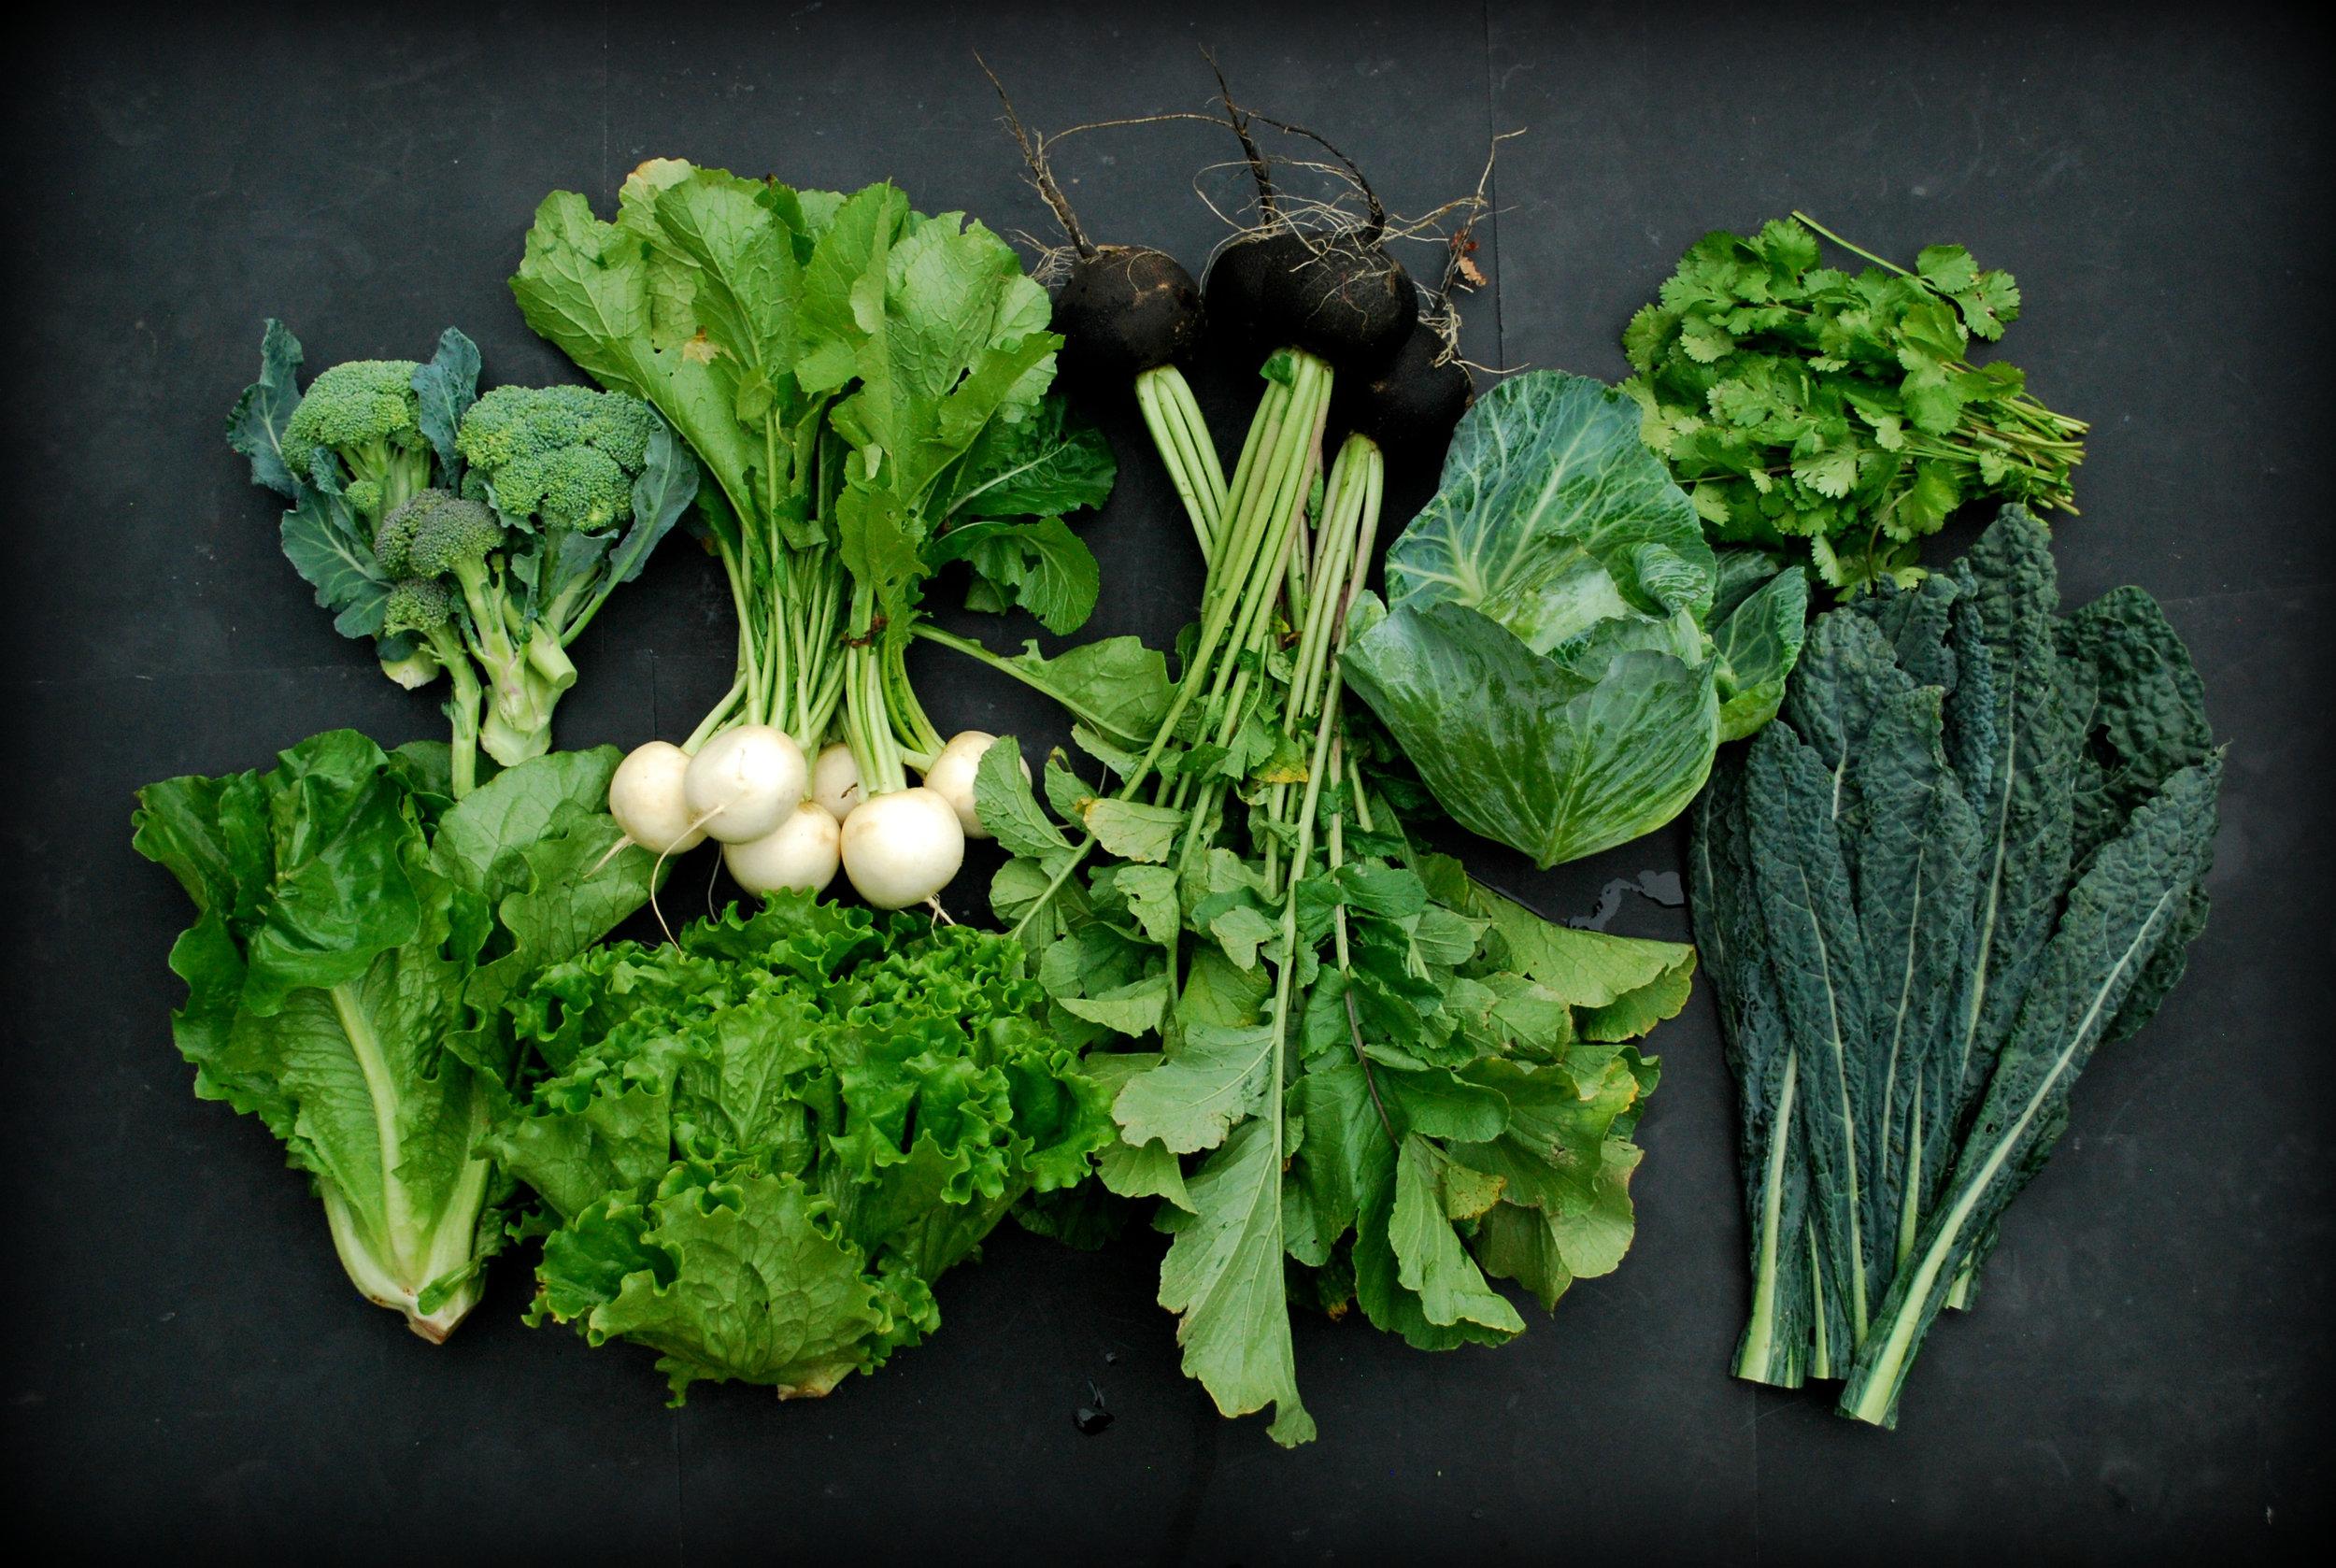 Your Week 6 CSA: Romaine lettuce, broccoli, salad turnips, green leaf lettuce, Nero Tondo radishes, cabbage, cilantro, dinosaur kale.